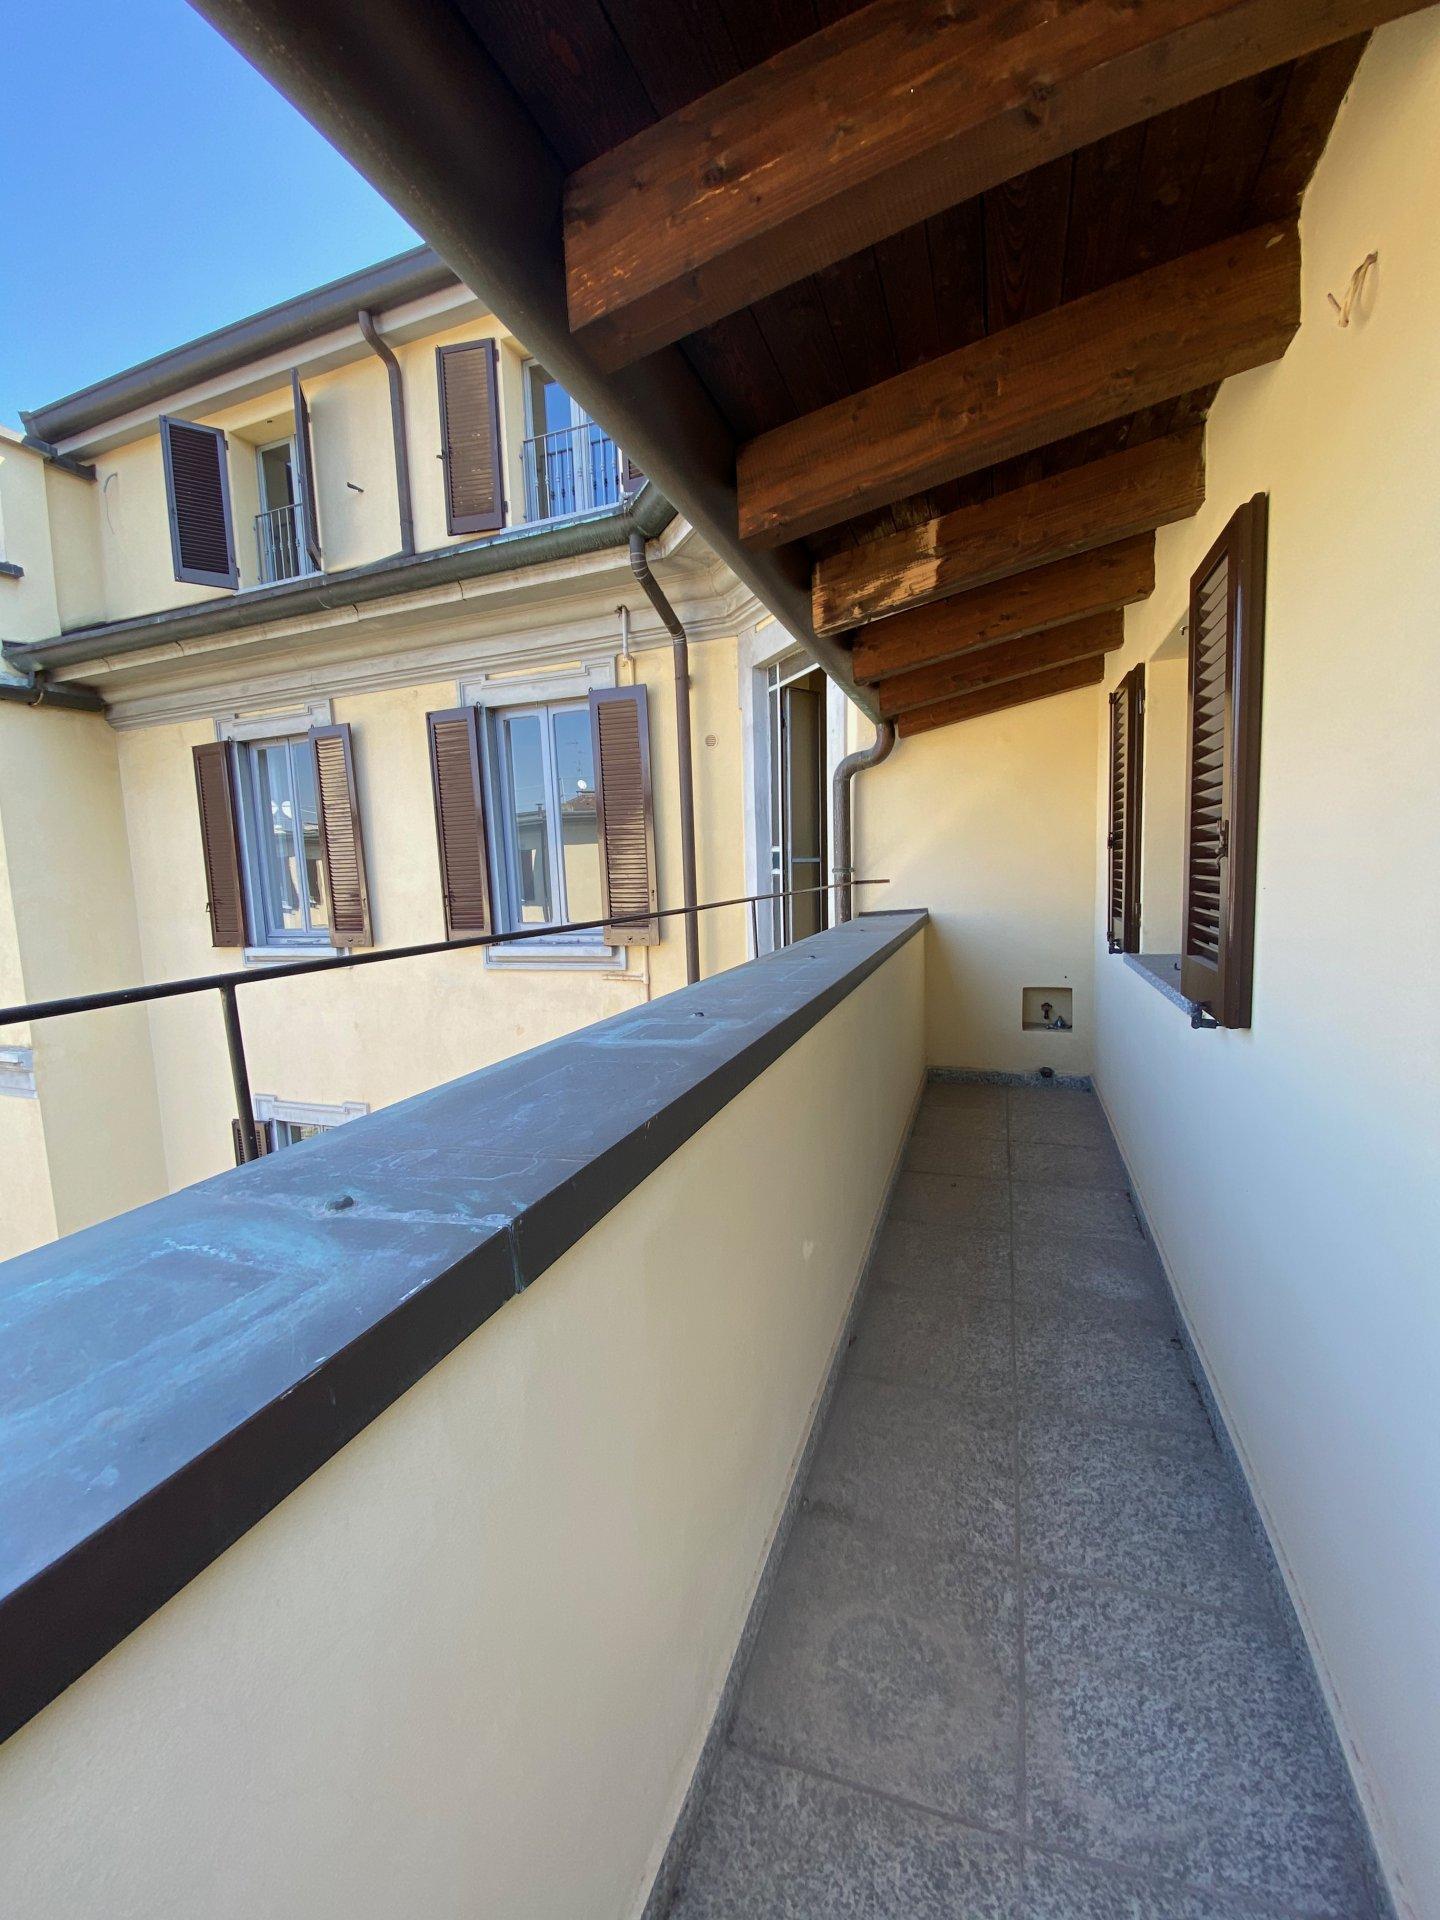 Affascinante mansarda con terrazzi